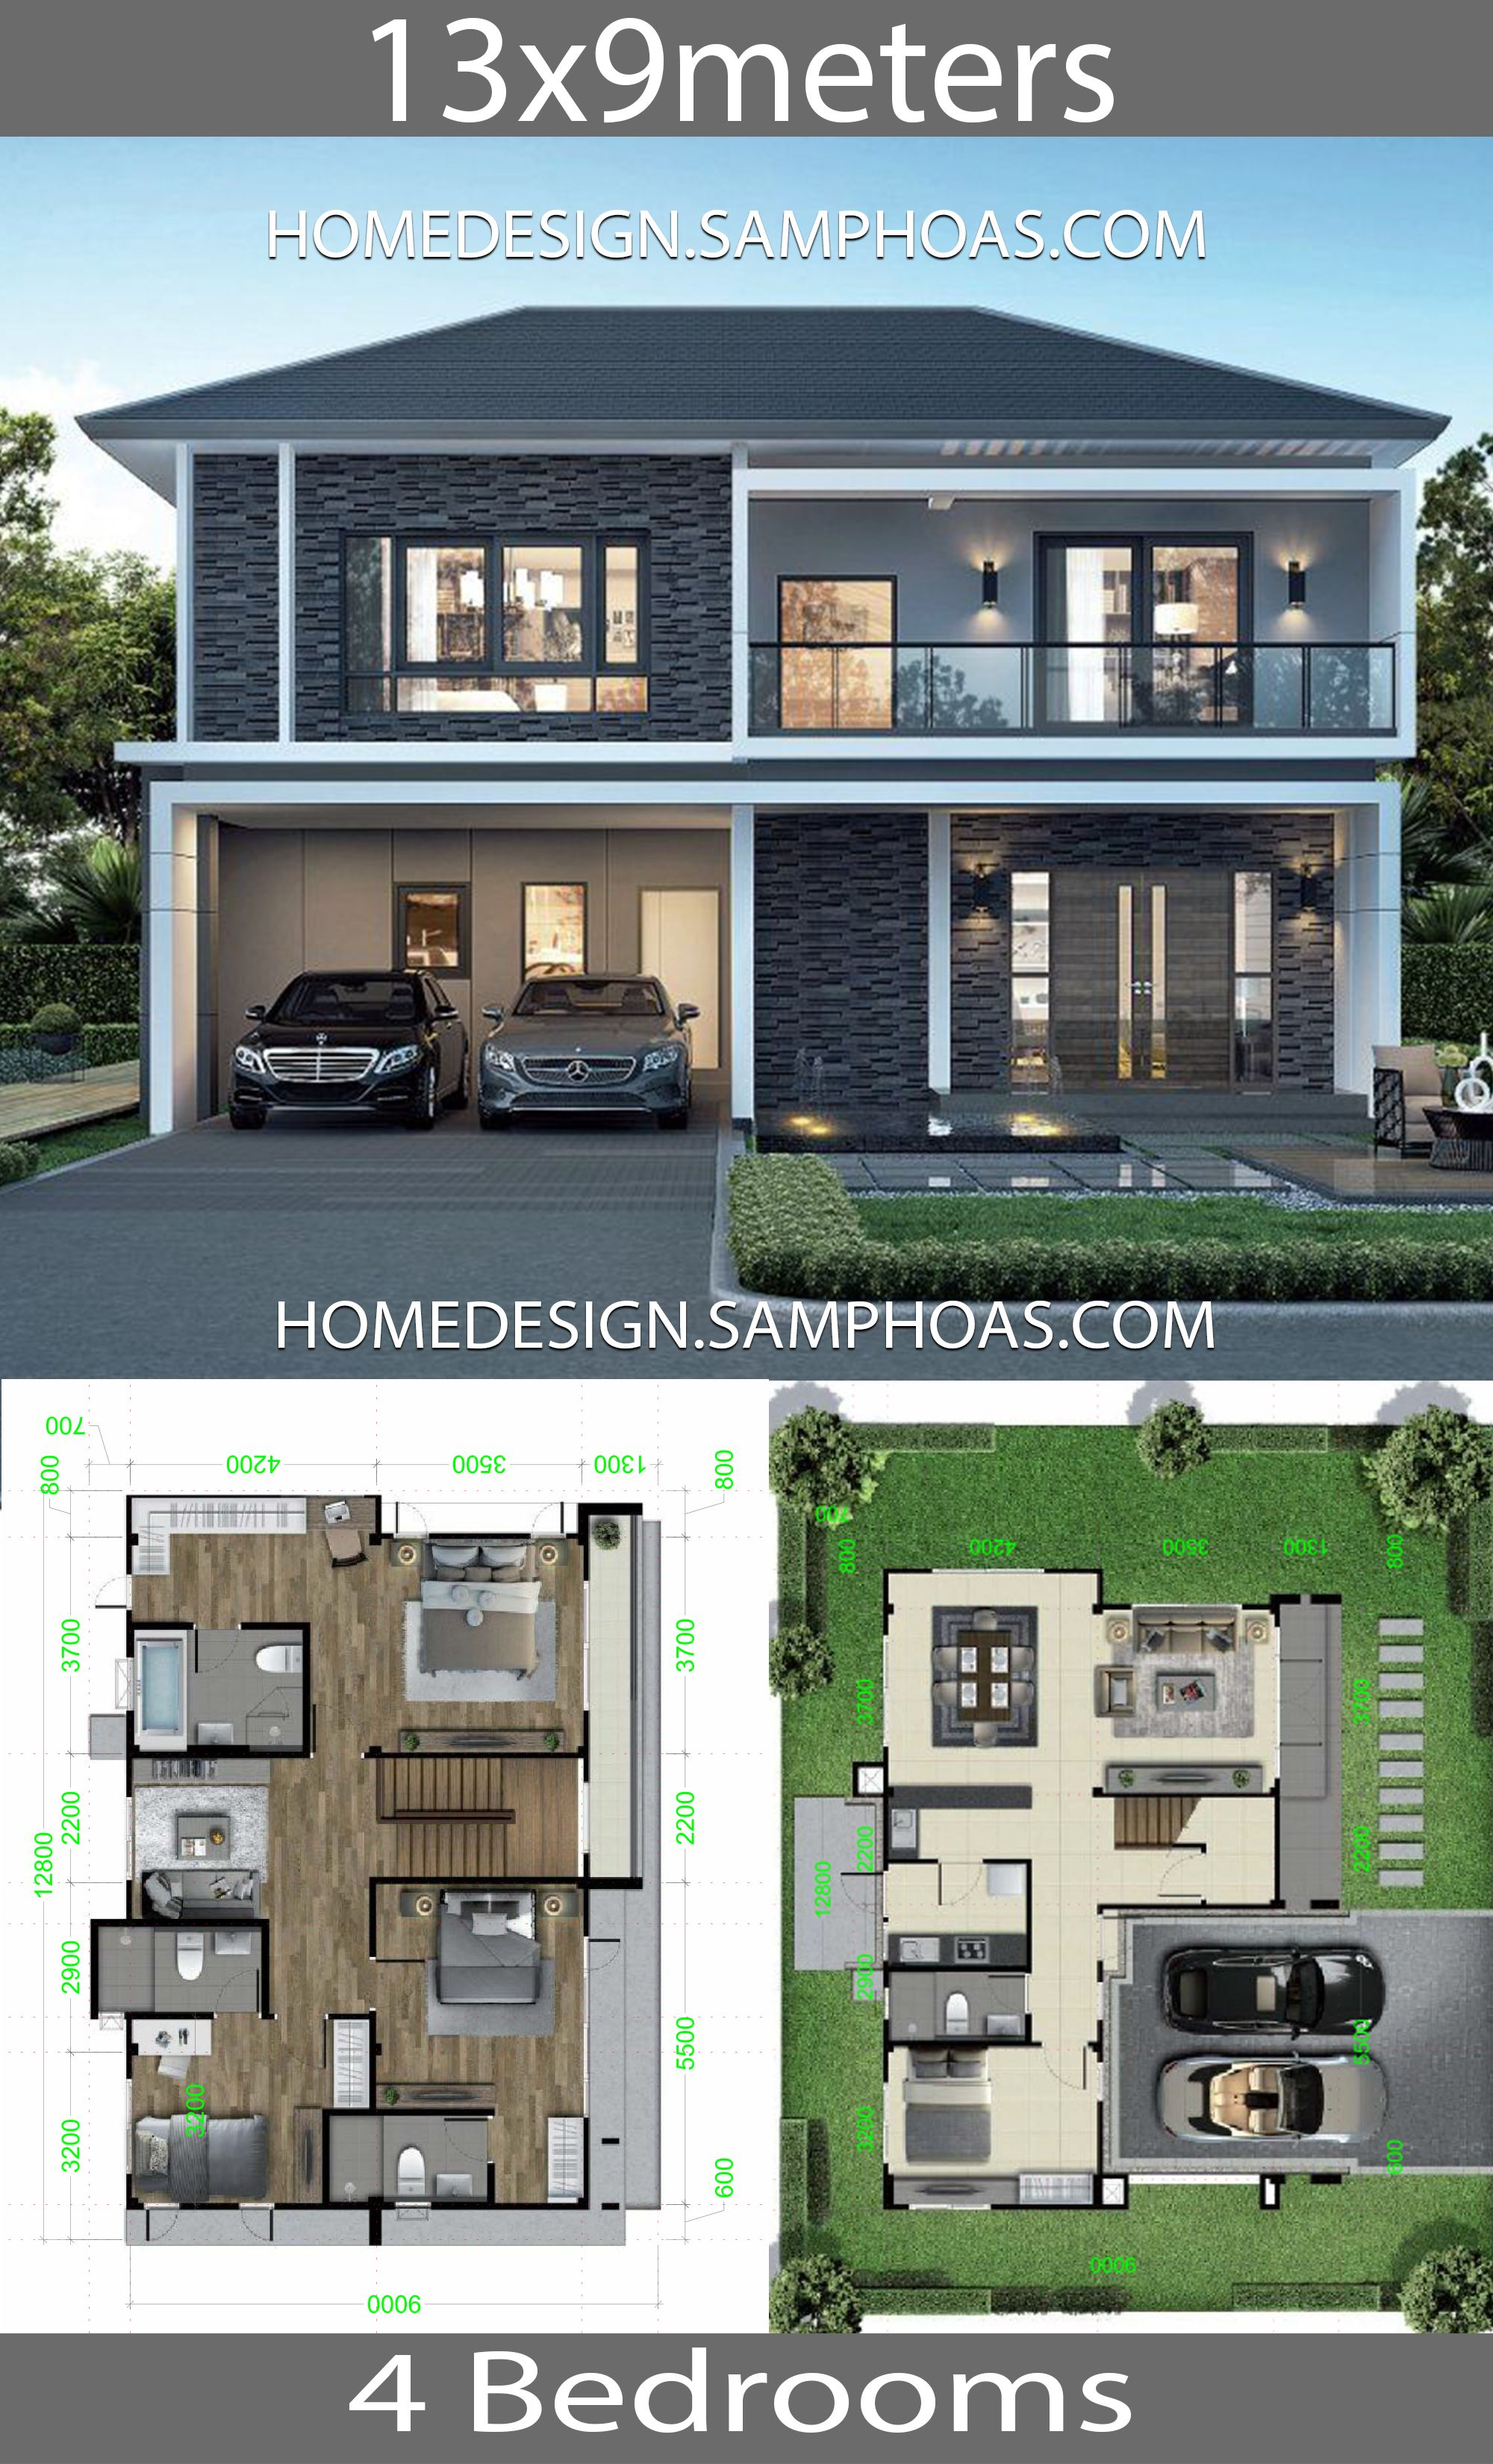 10 Best House Design Plans With Floor Plans House Plans 3d Building Plans House 2 Storey House Design Home Building Design